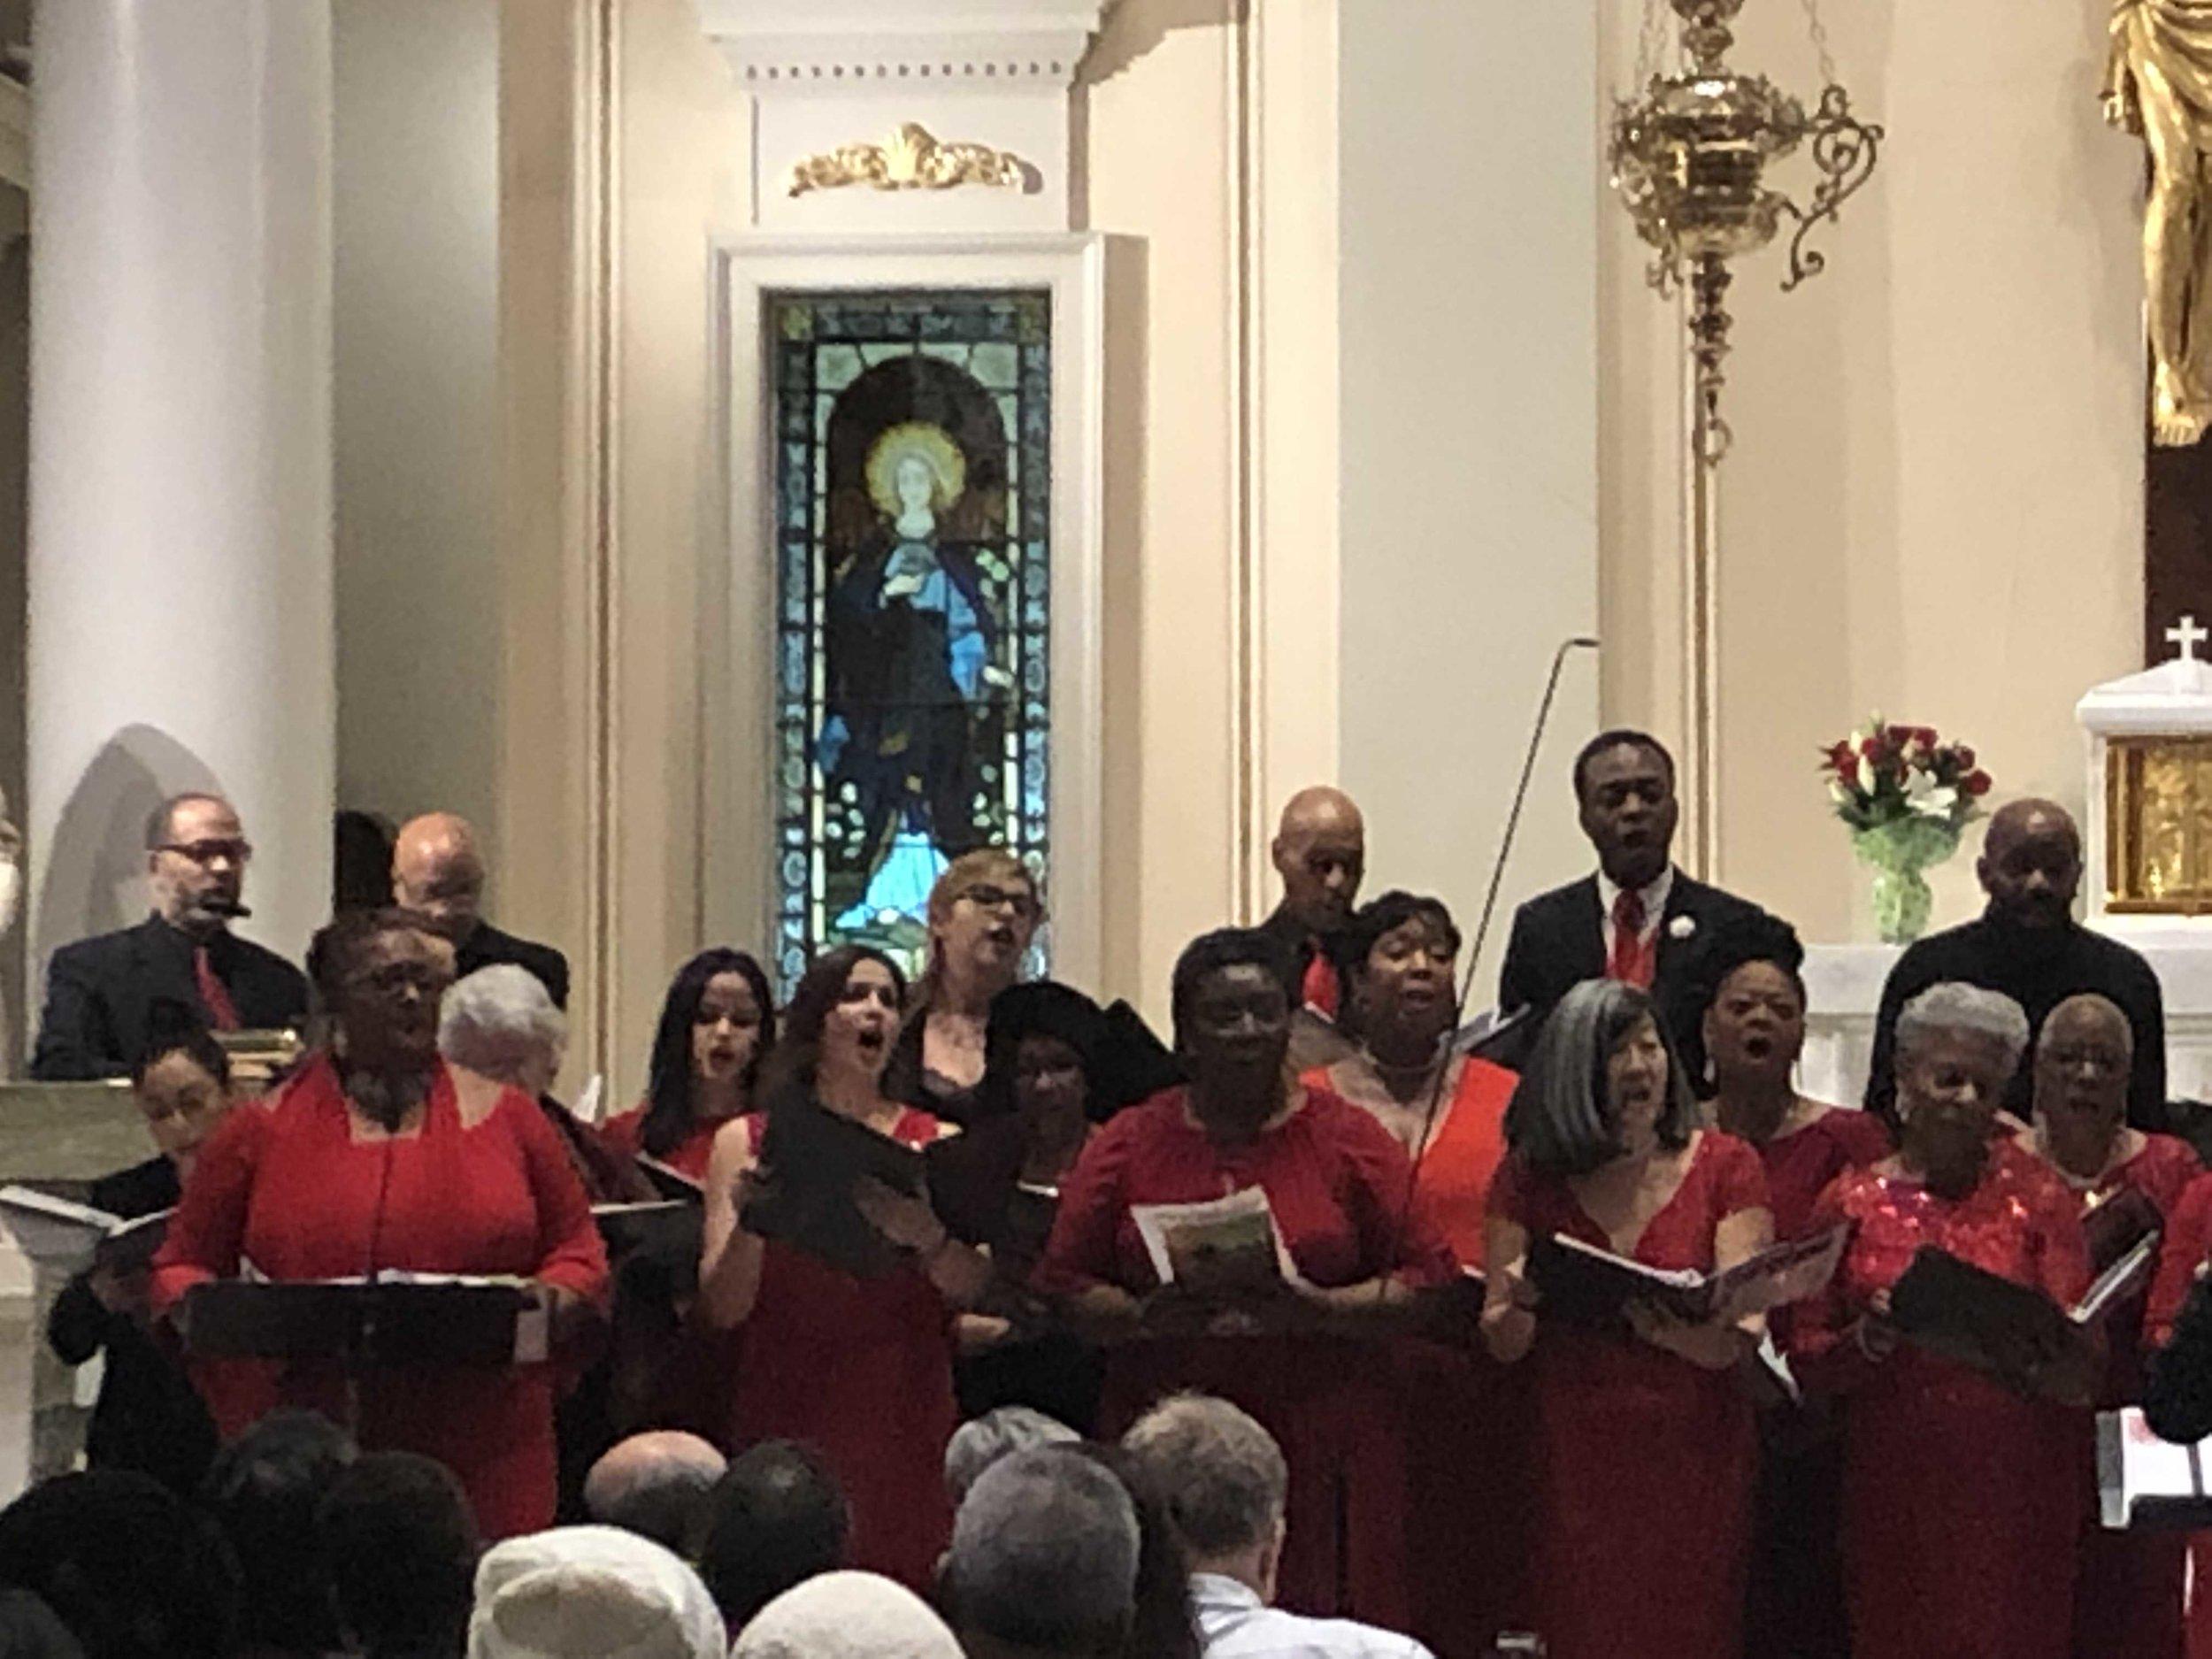 IMG_2308-mark-howell-singers-saint-francis-de-sales-church-sing-joy-adult-choir-gospel-new-york-city.jpg